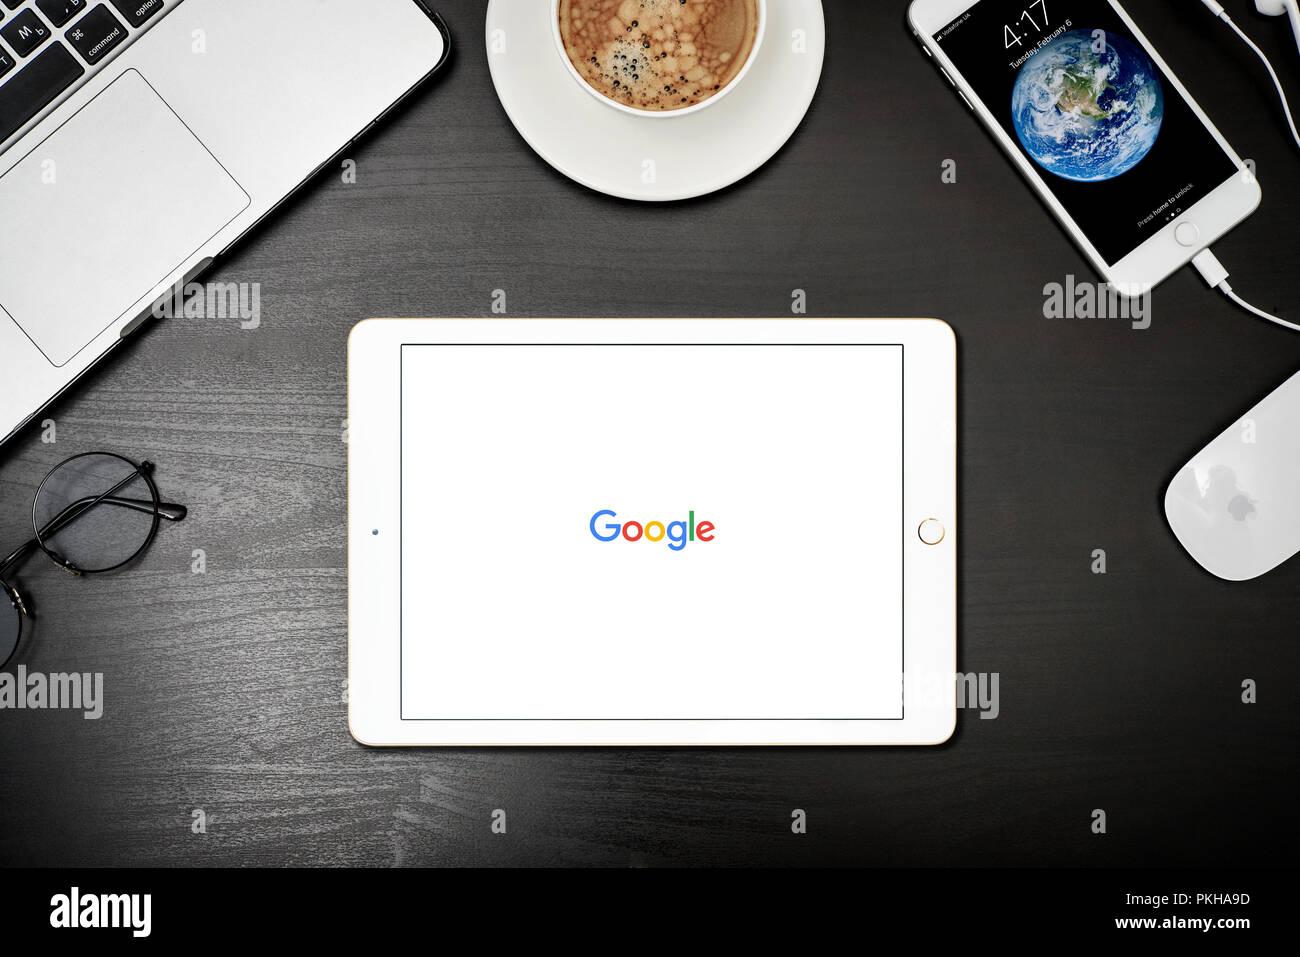 Kyiv, Ukraine - Fabruary 6, 2018: Apple iPad Gold with Google search  app on the screen on black desk, top view. Google search application is the sear - Stock Image